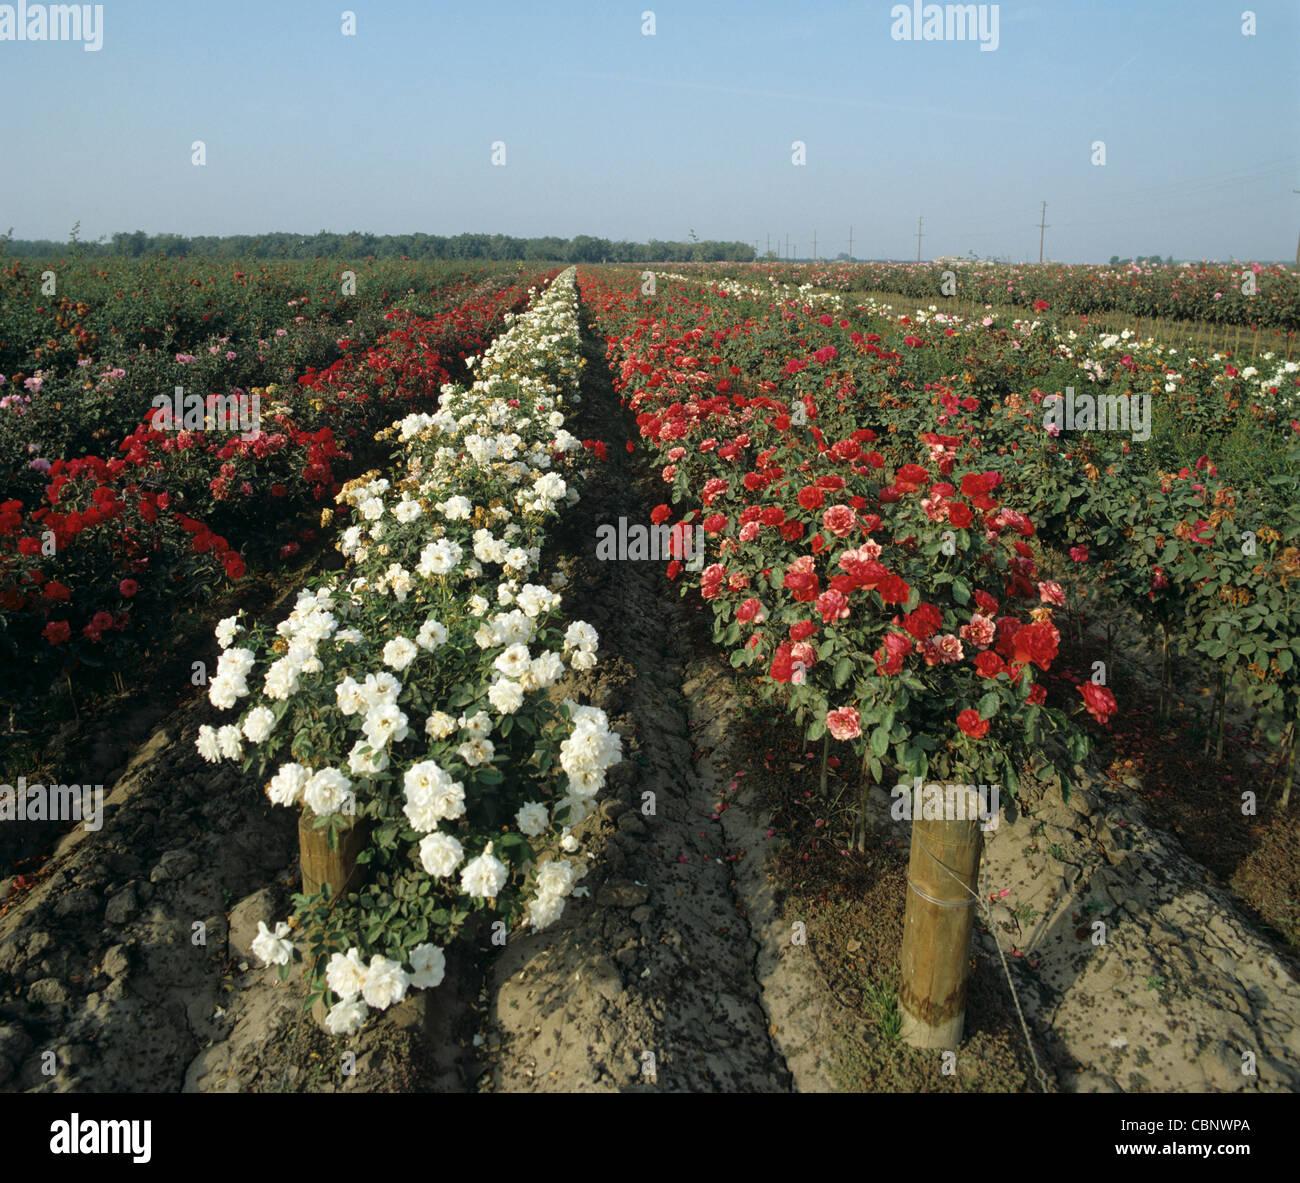 Nursery field rose crops in flower, California, USA - Stock Image